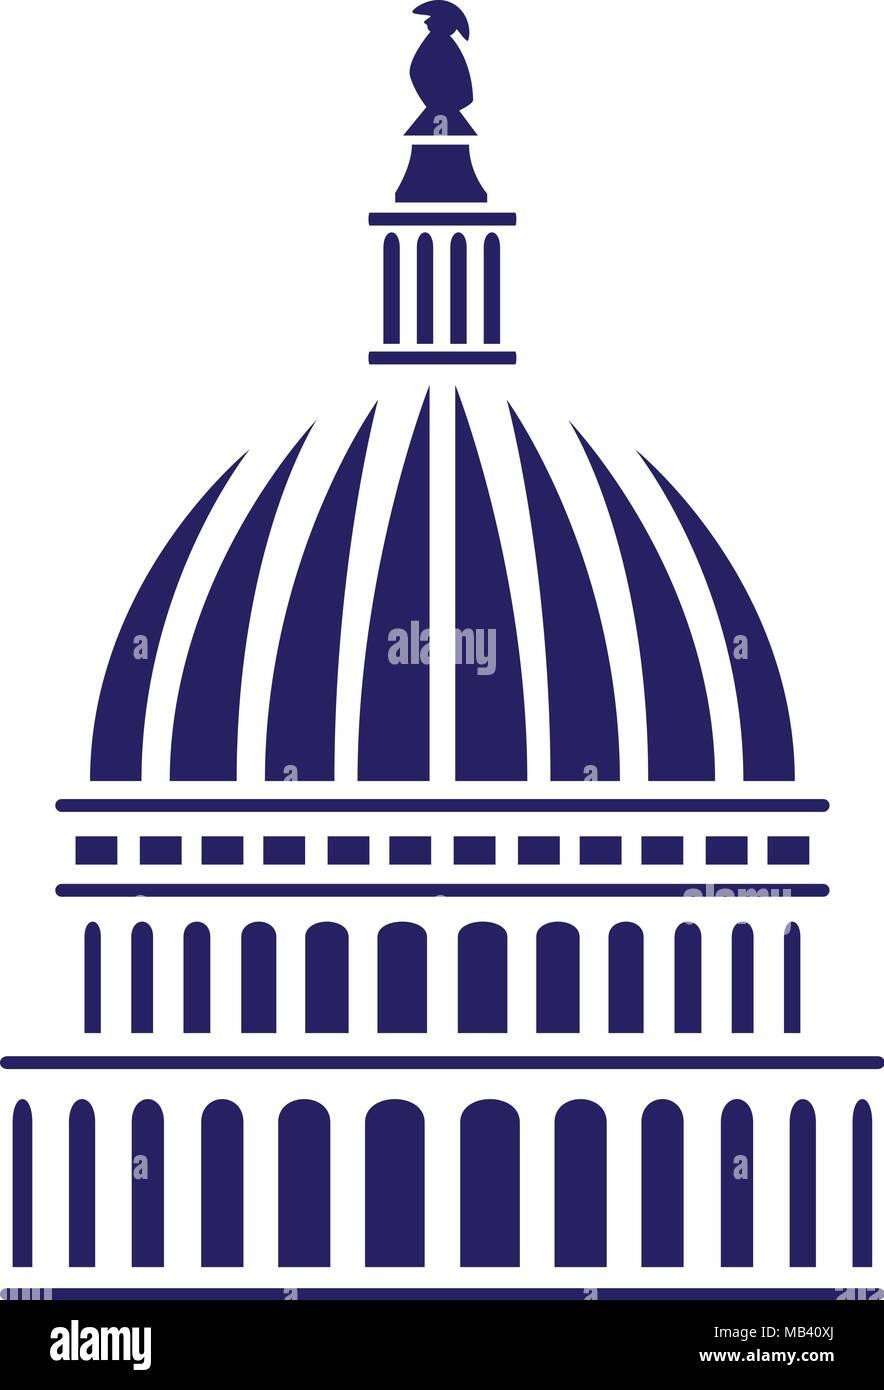 U.S. Capitol Dome Vector Illustration - Stock Vector